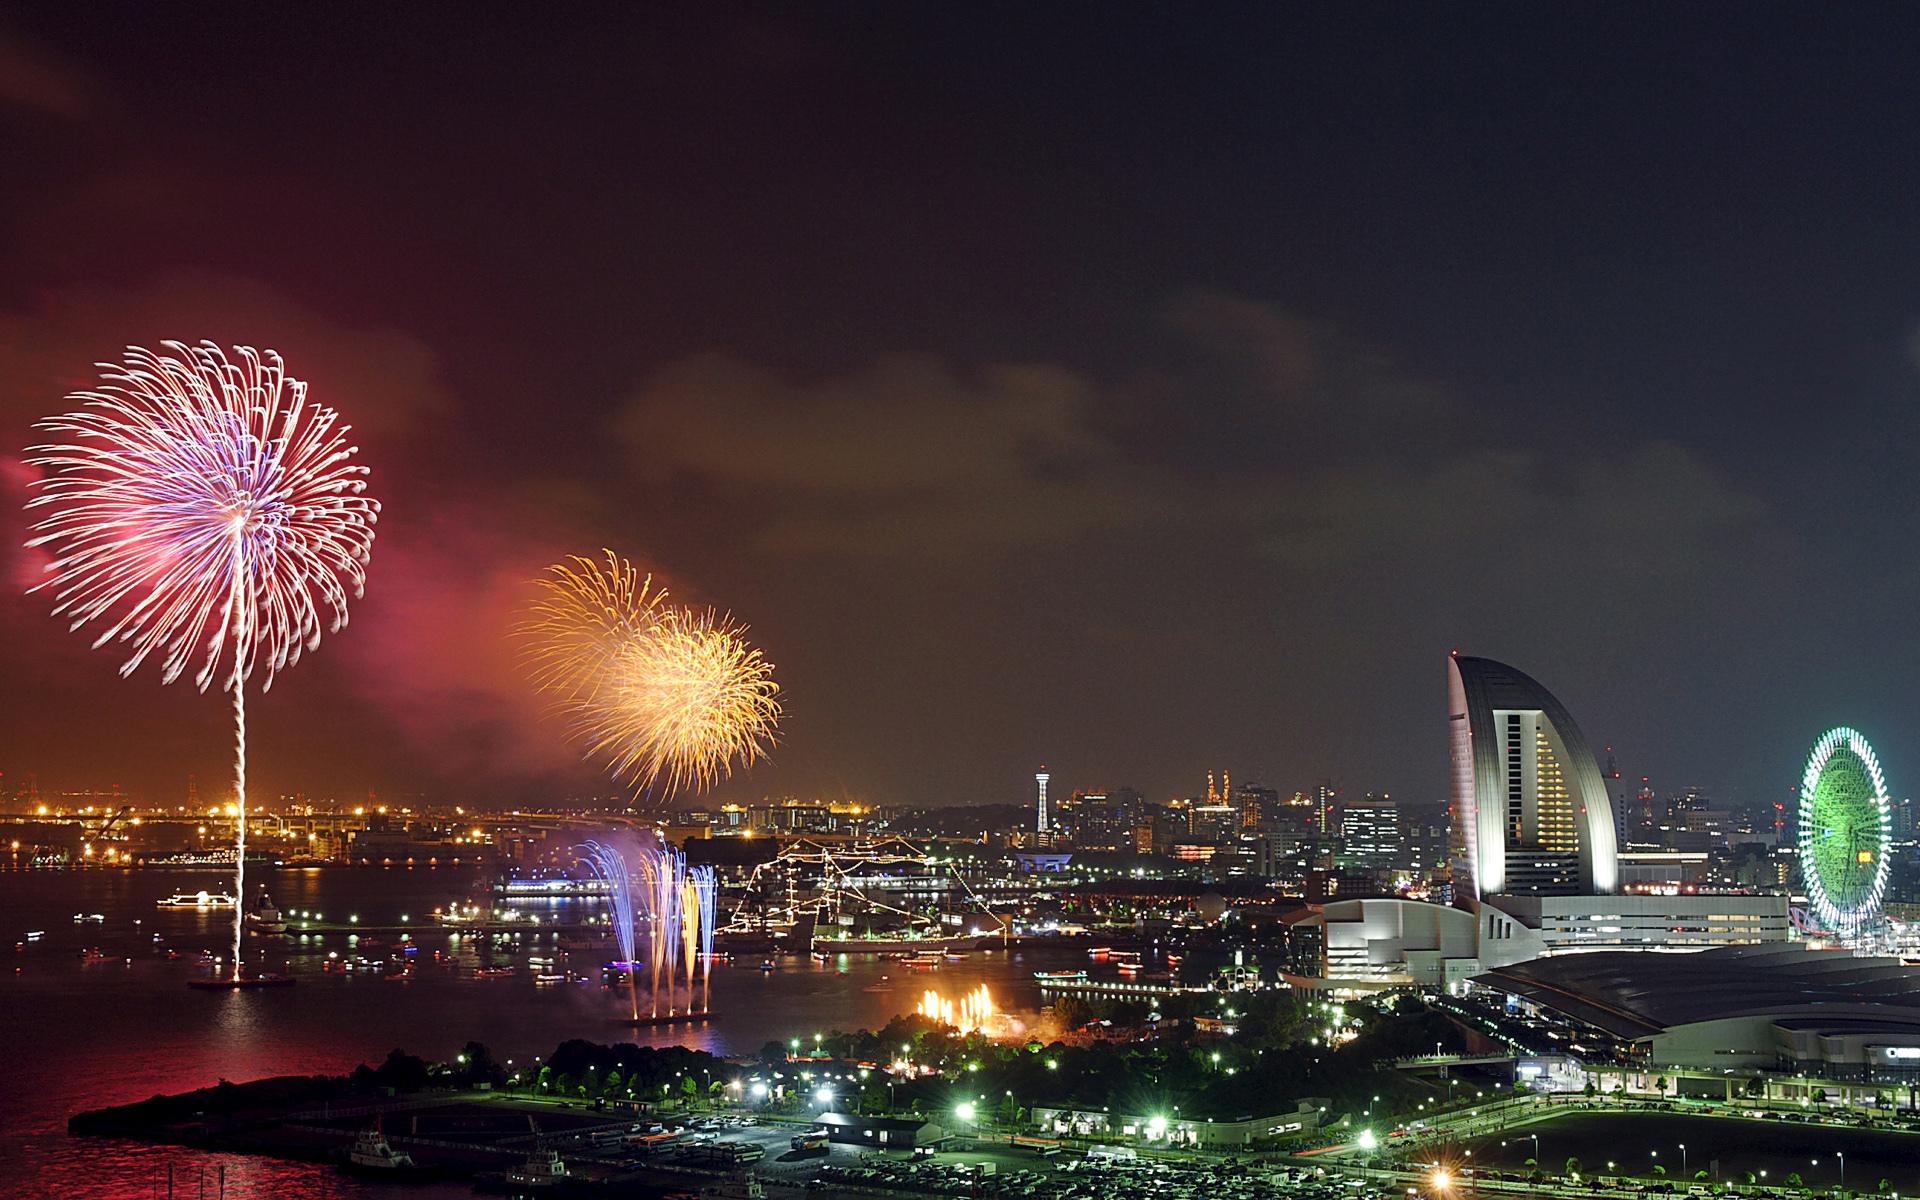 1920x1200 px architecture buildings celebration cities fireworks holidays japan kanagawa lights new year night sky world